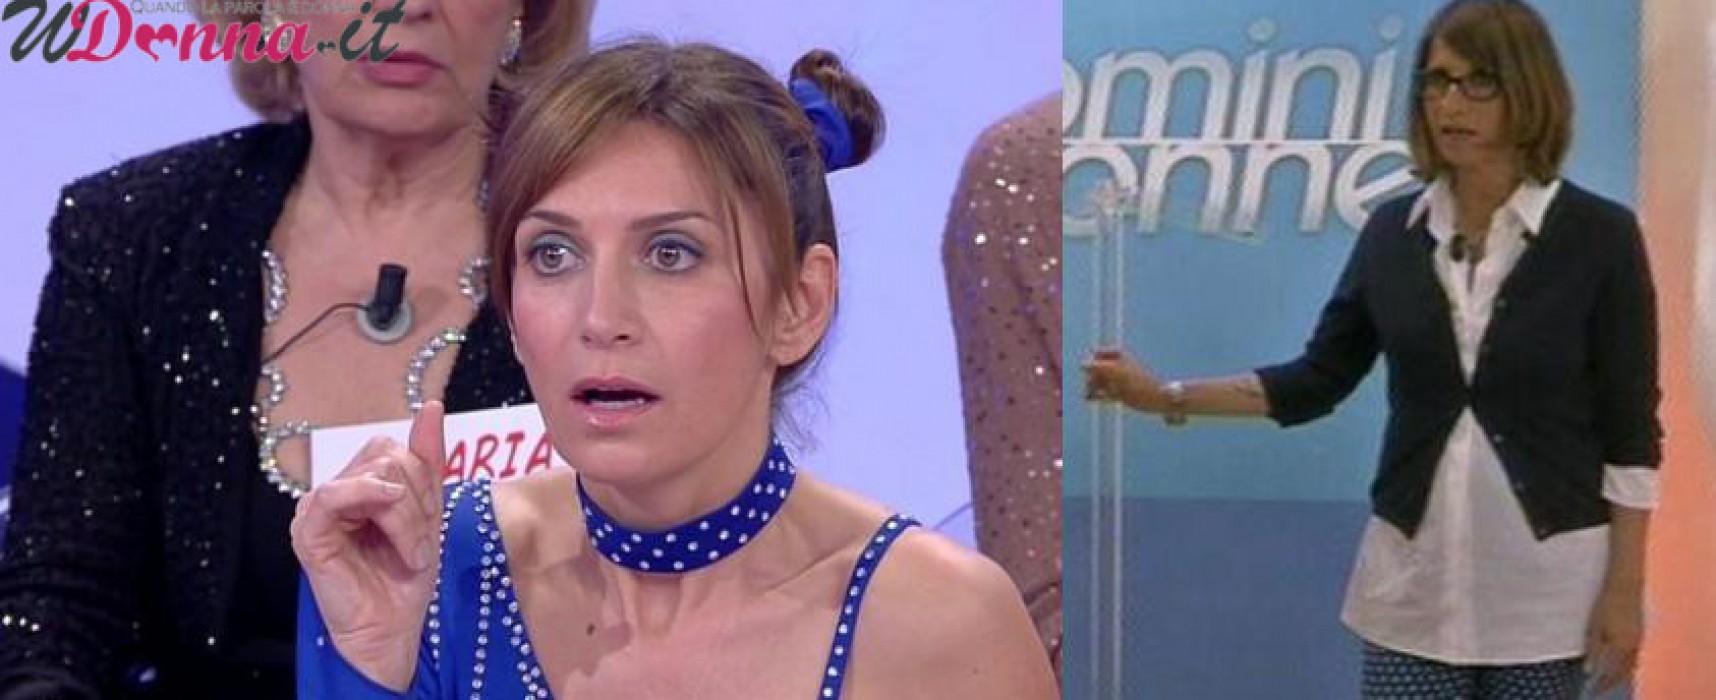 Anahi Ricca contro Barbara